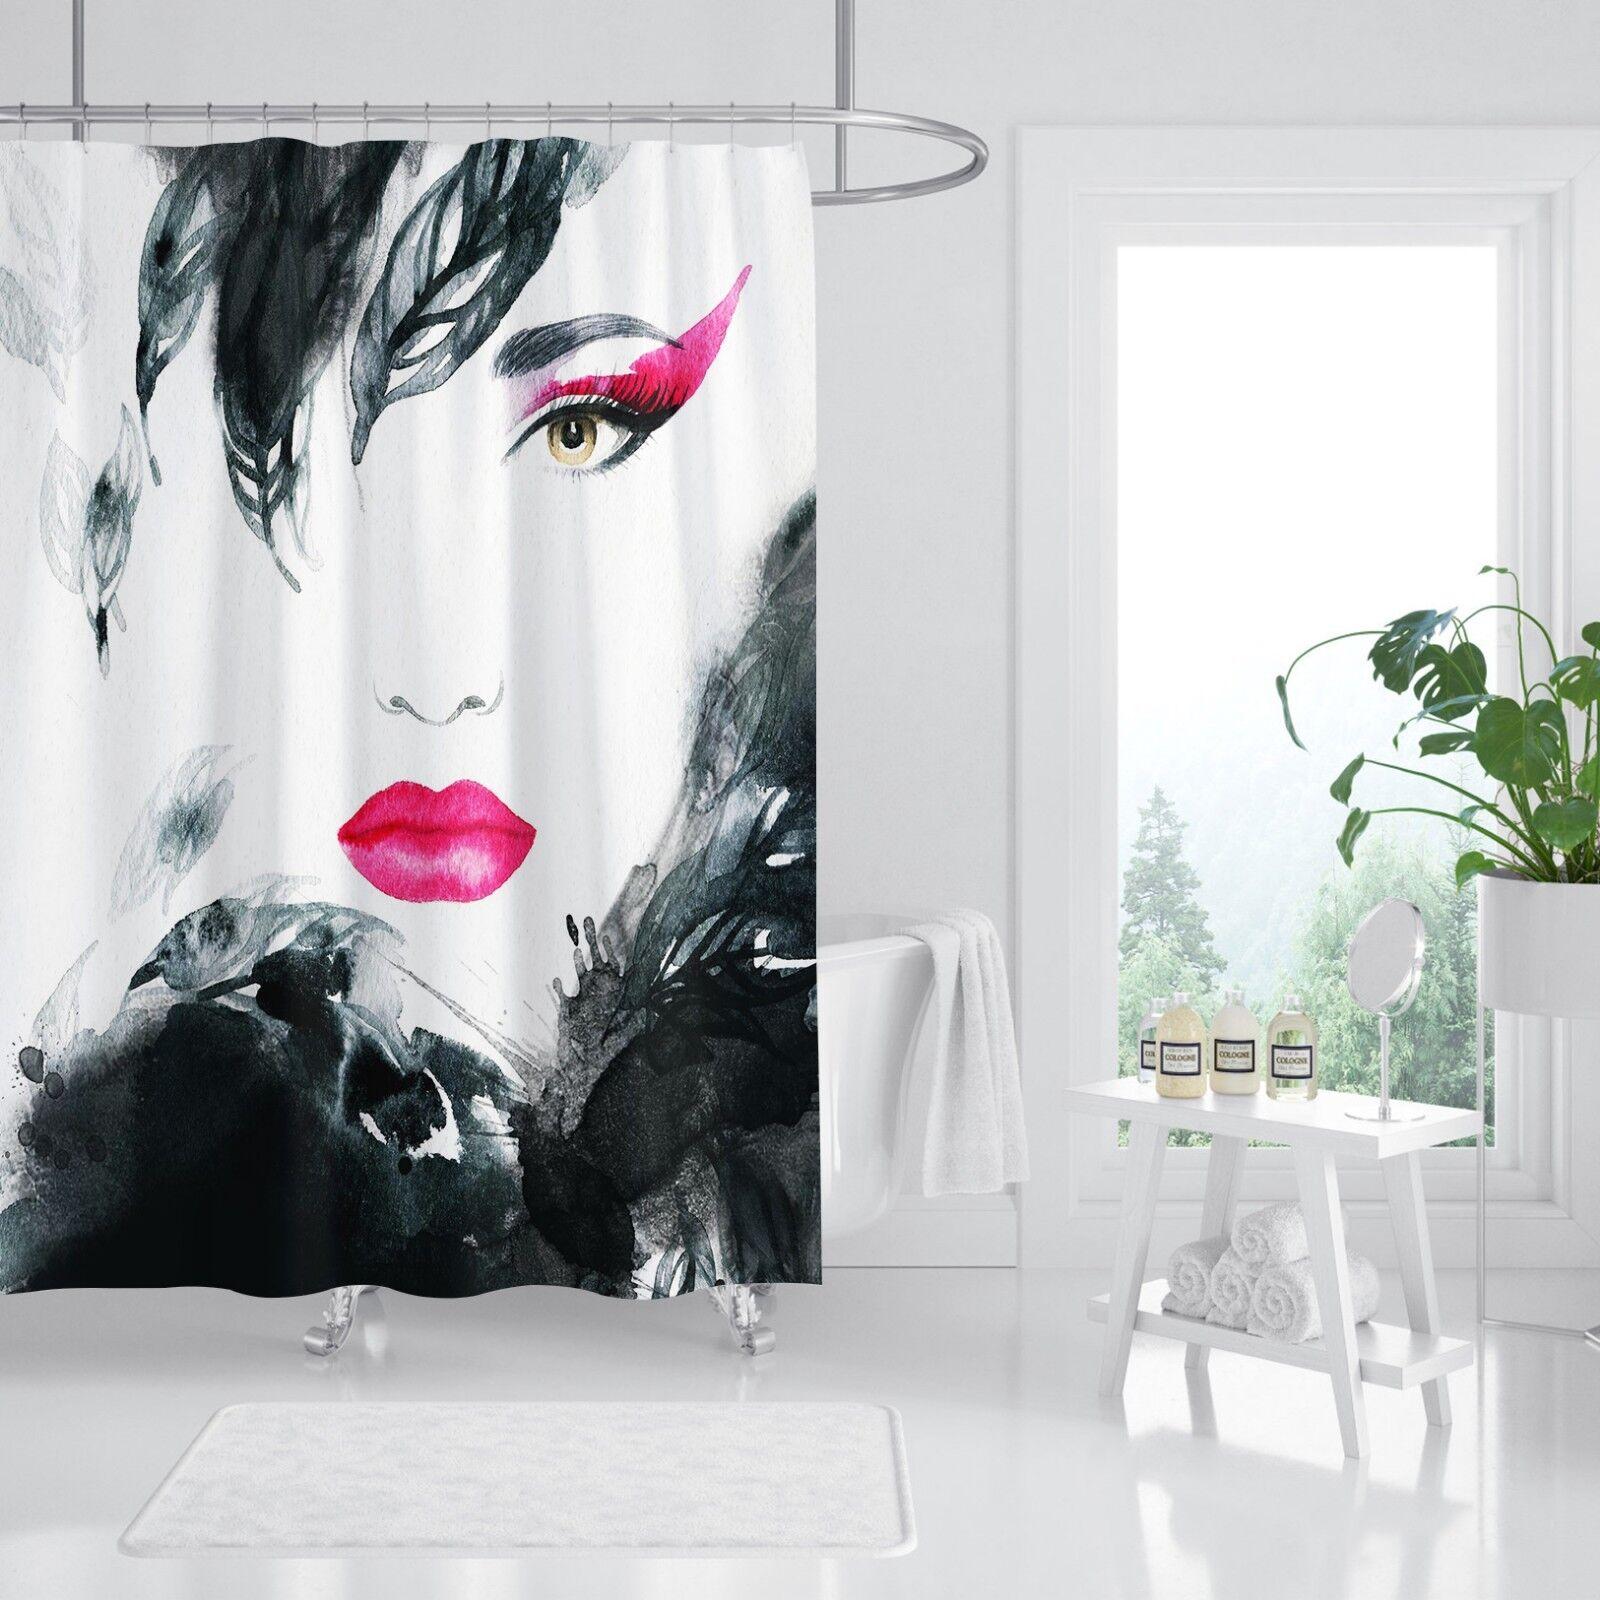 3D 3D 3D Kunst Frau 53 Duschvorhang Wasserdicht Faser Bad Daheim Windows Toilette DE | Billiger als der Preis  6331af